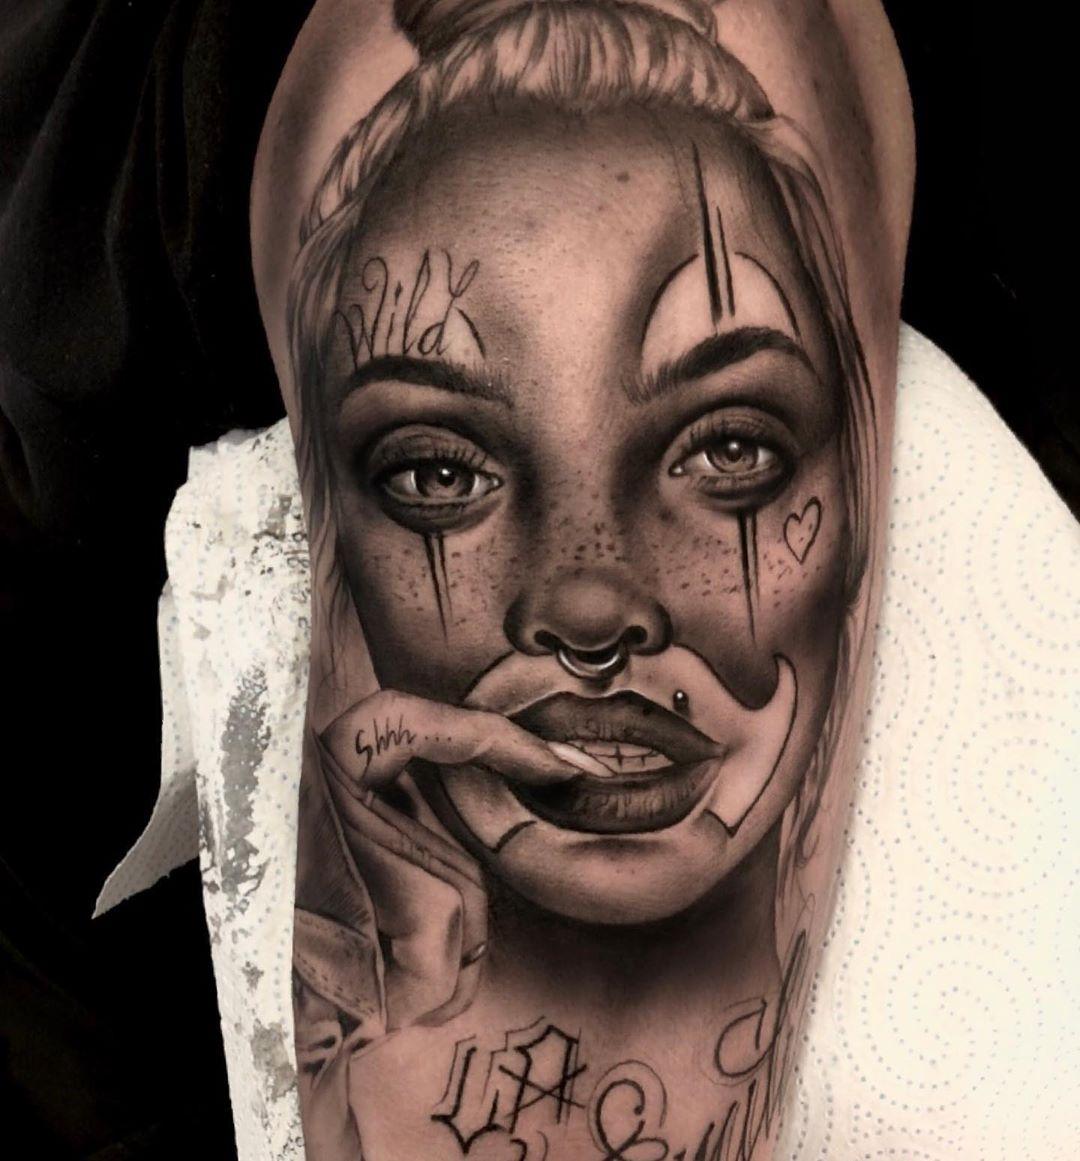 followforfollow,berlin,followmeciudadreal,ciudadreal,tomelloso,almagro,puertollano,tatuajesenpuertollano,tatuajesendaimiel,ciudadrealtattoo,cciudadrealtatuajes,tatuajesciudadreal,follow,ciudadrealtatuajes,puertollano,tattooers,besttattooers,juantabasco,ciudadrealsetatua,ink,tatuajes,realiismo,realistictattoo,ciudadrealtattoo,tatuajesenpuertollano,traditionaltattoos,castillalamancha,ink,tattooart,zurichtattoo,daimiel,inkedgirls,inkig,ink